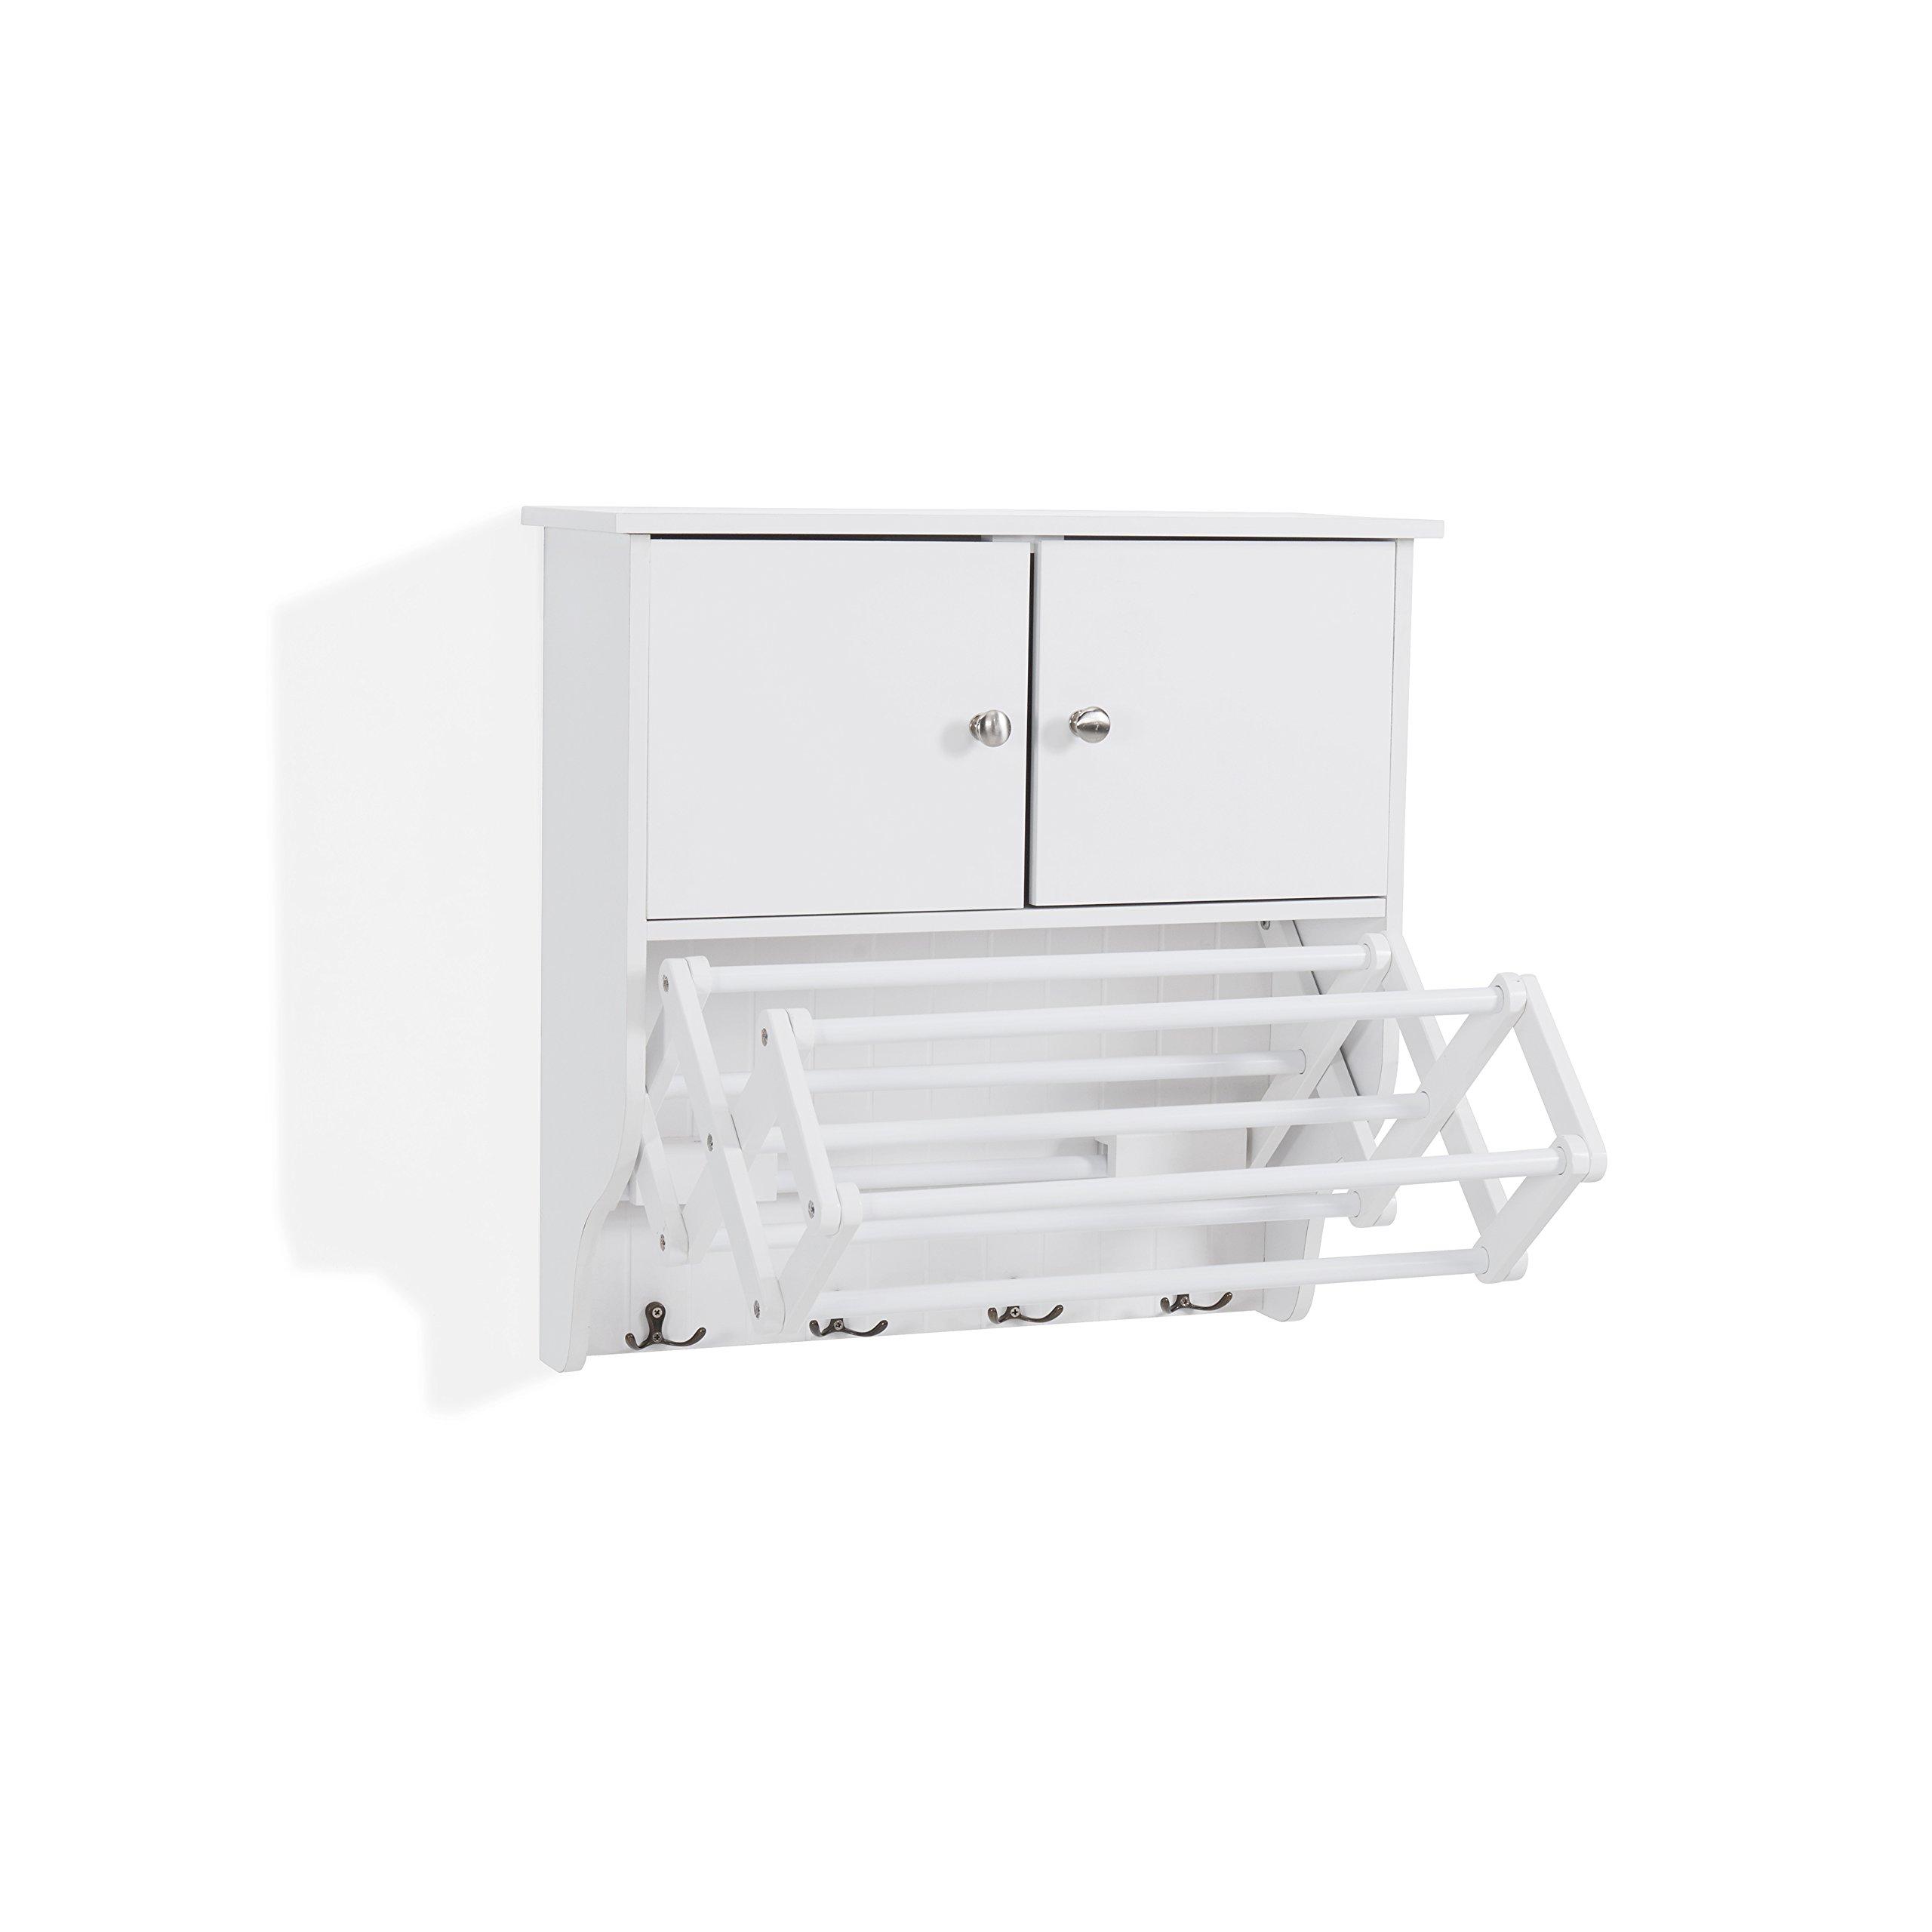 Danya B. Accordion Wall Mount Drying Rack with Cabinet,White